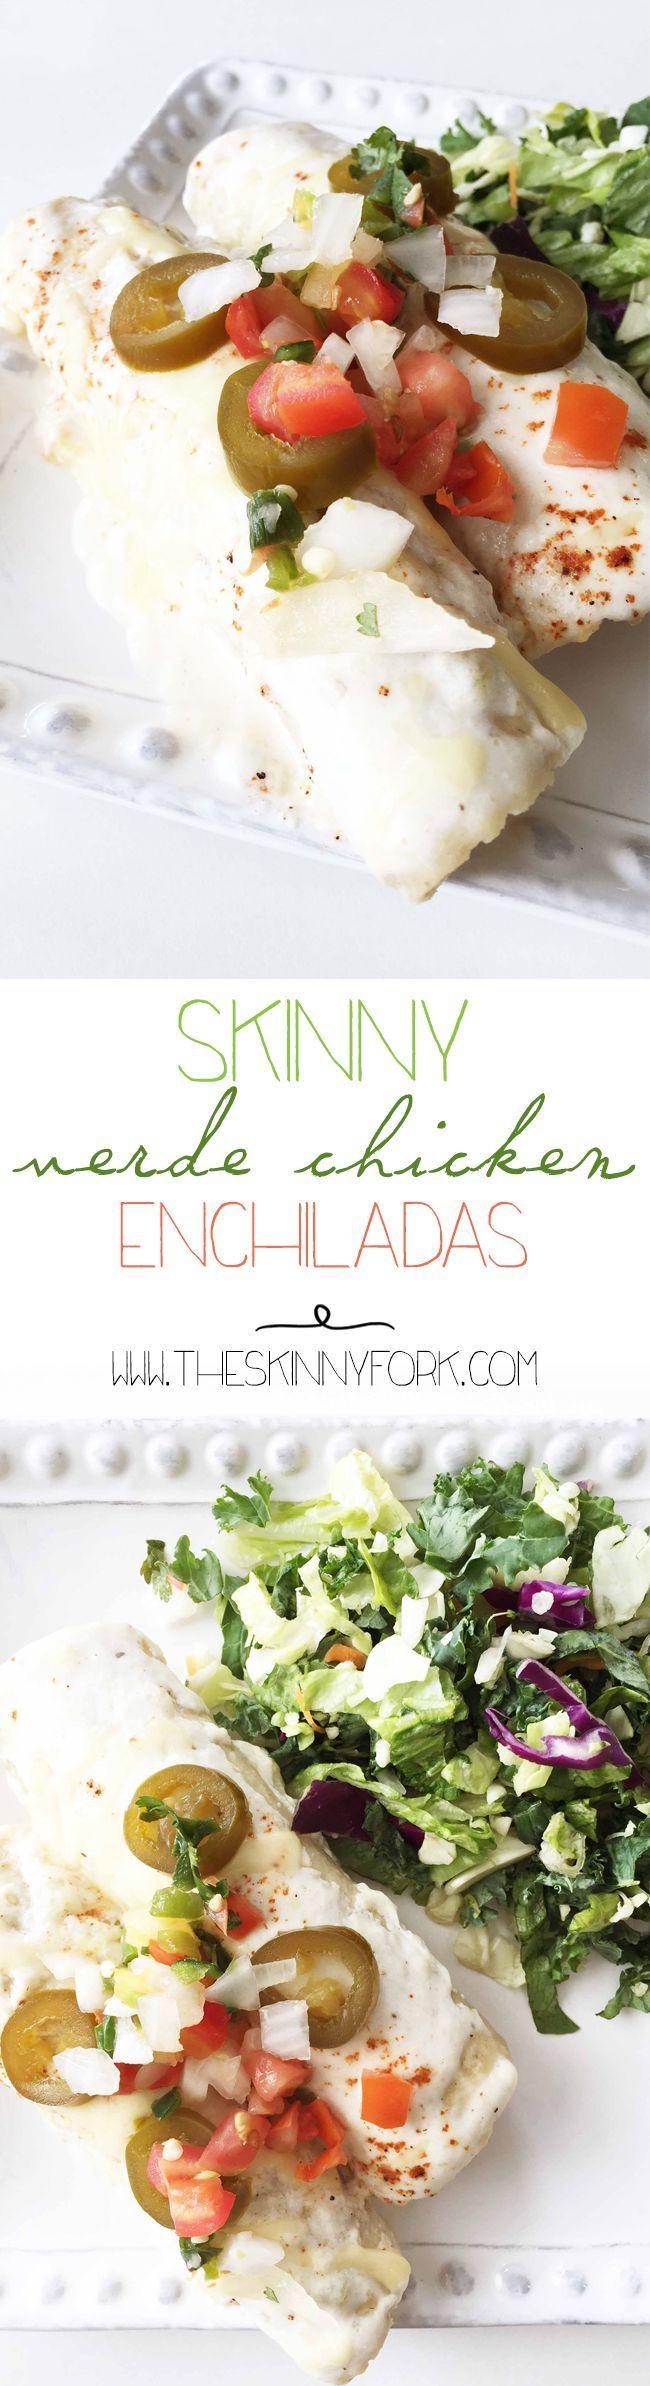 Skinny Verde Chicken Enchiladas - A light take chicken sour cream enchiladas made with yogurt and green chilies! TheSkinnyFork.com | Skinny & Healthy Recipes